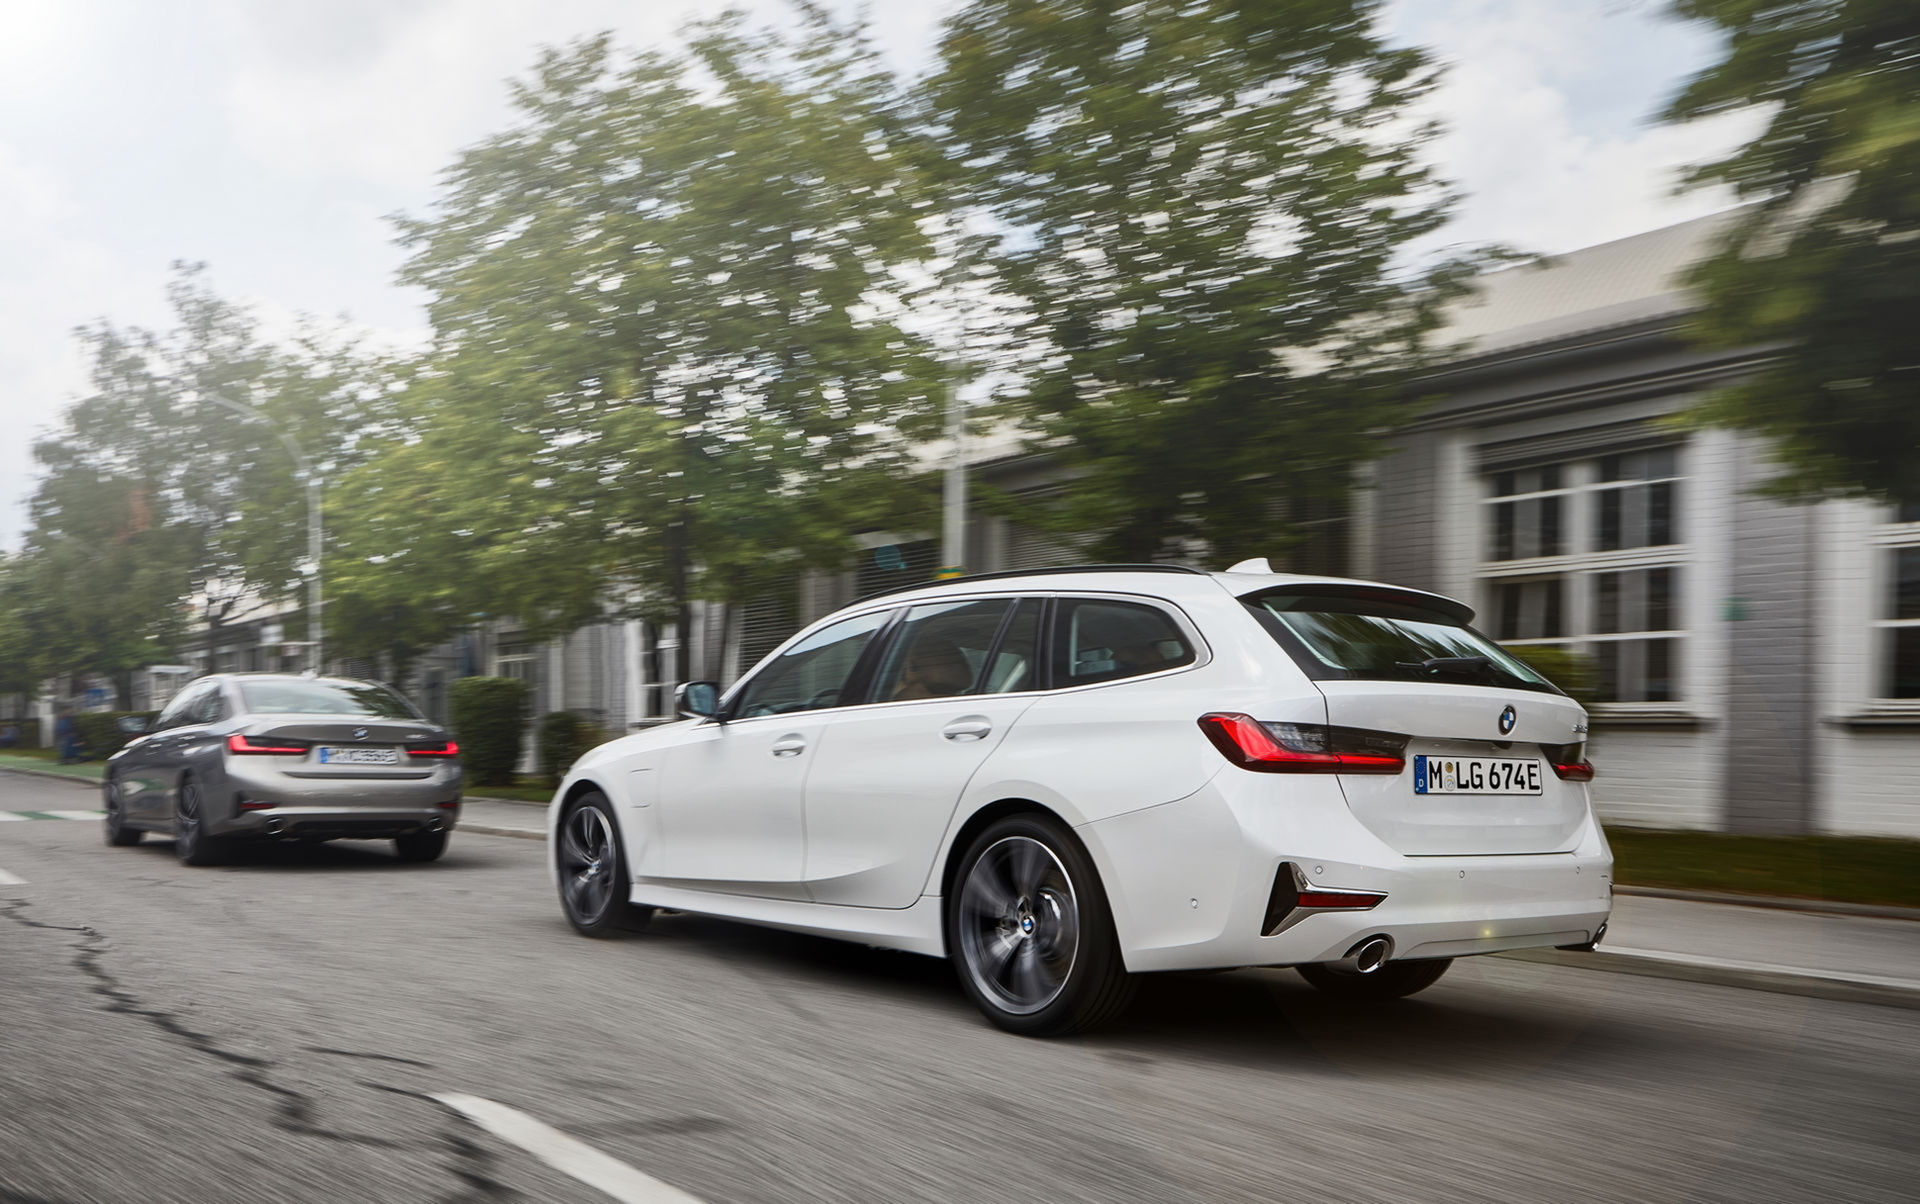 BMW:s 3-serie får tre nya laddhybrid-alternativ